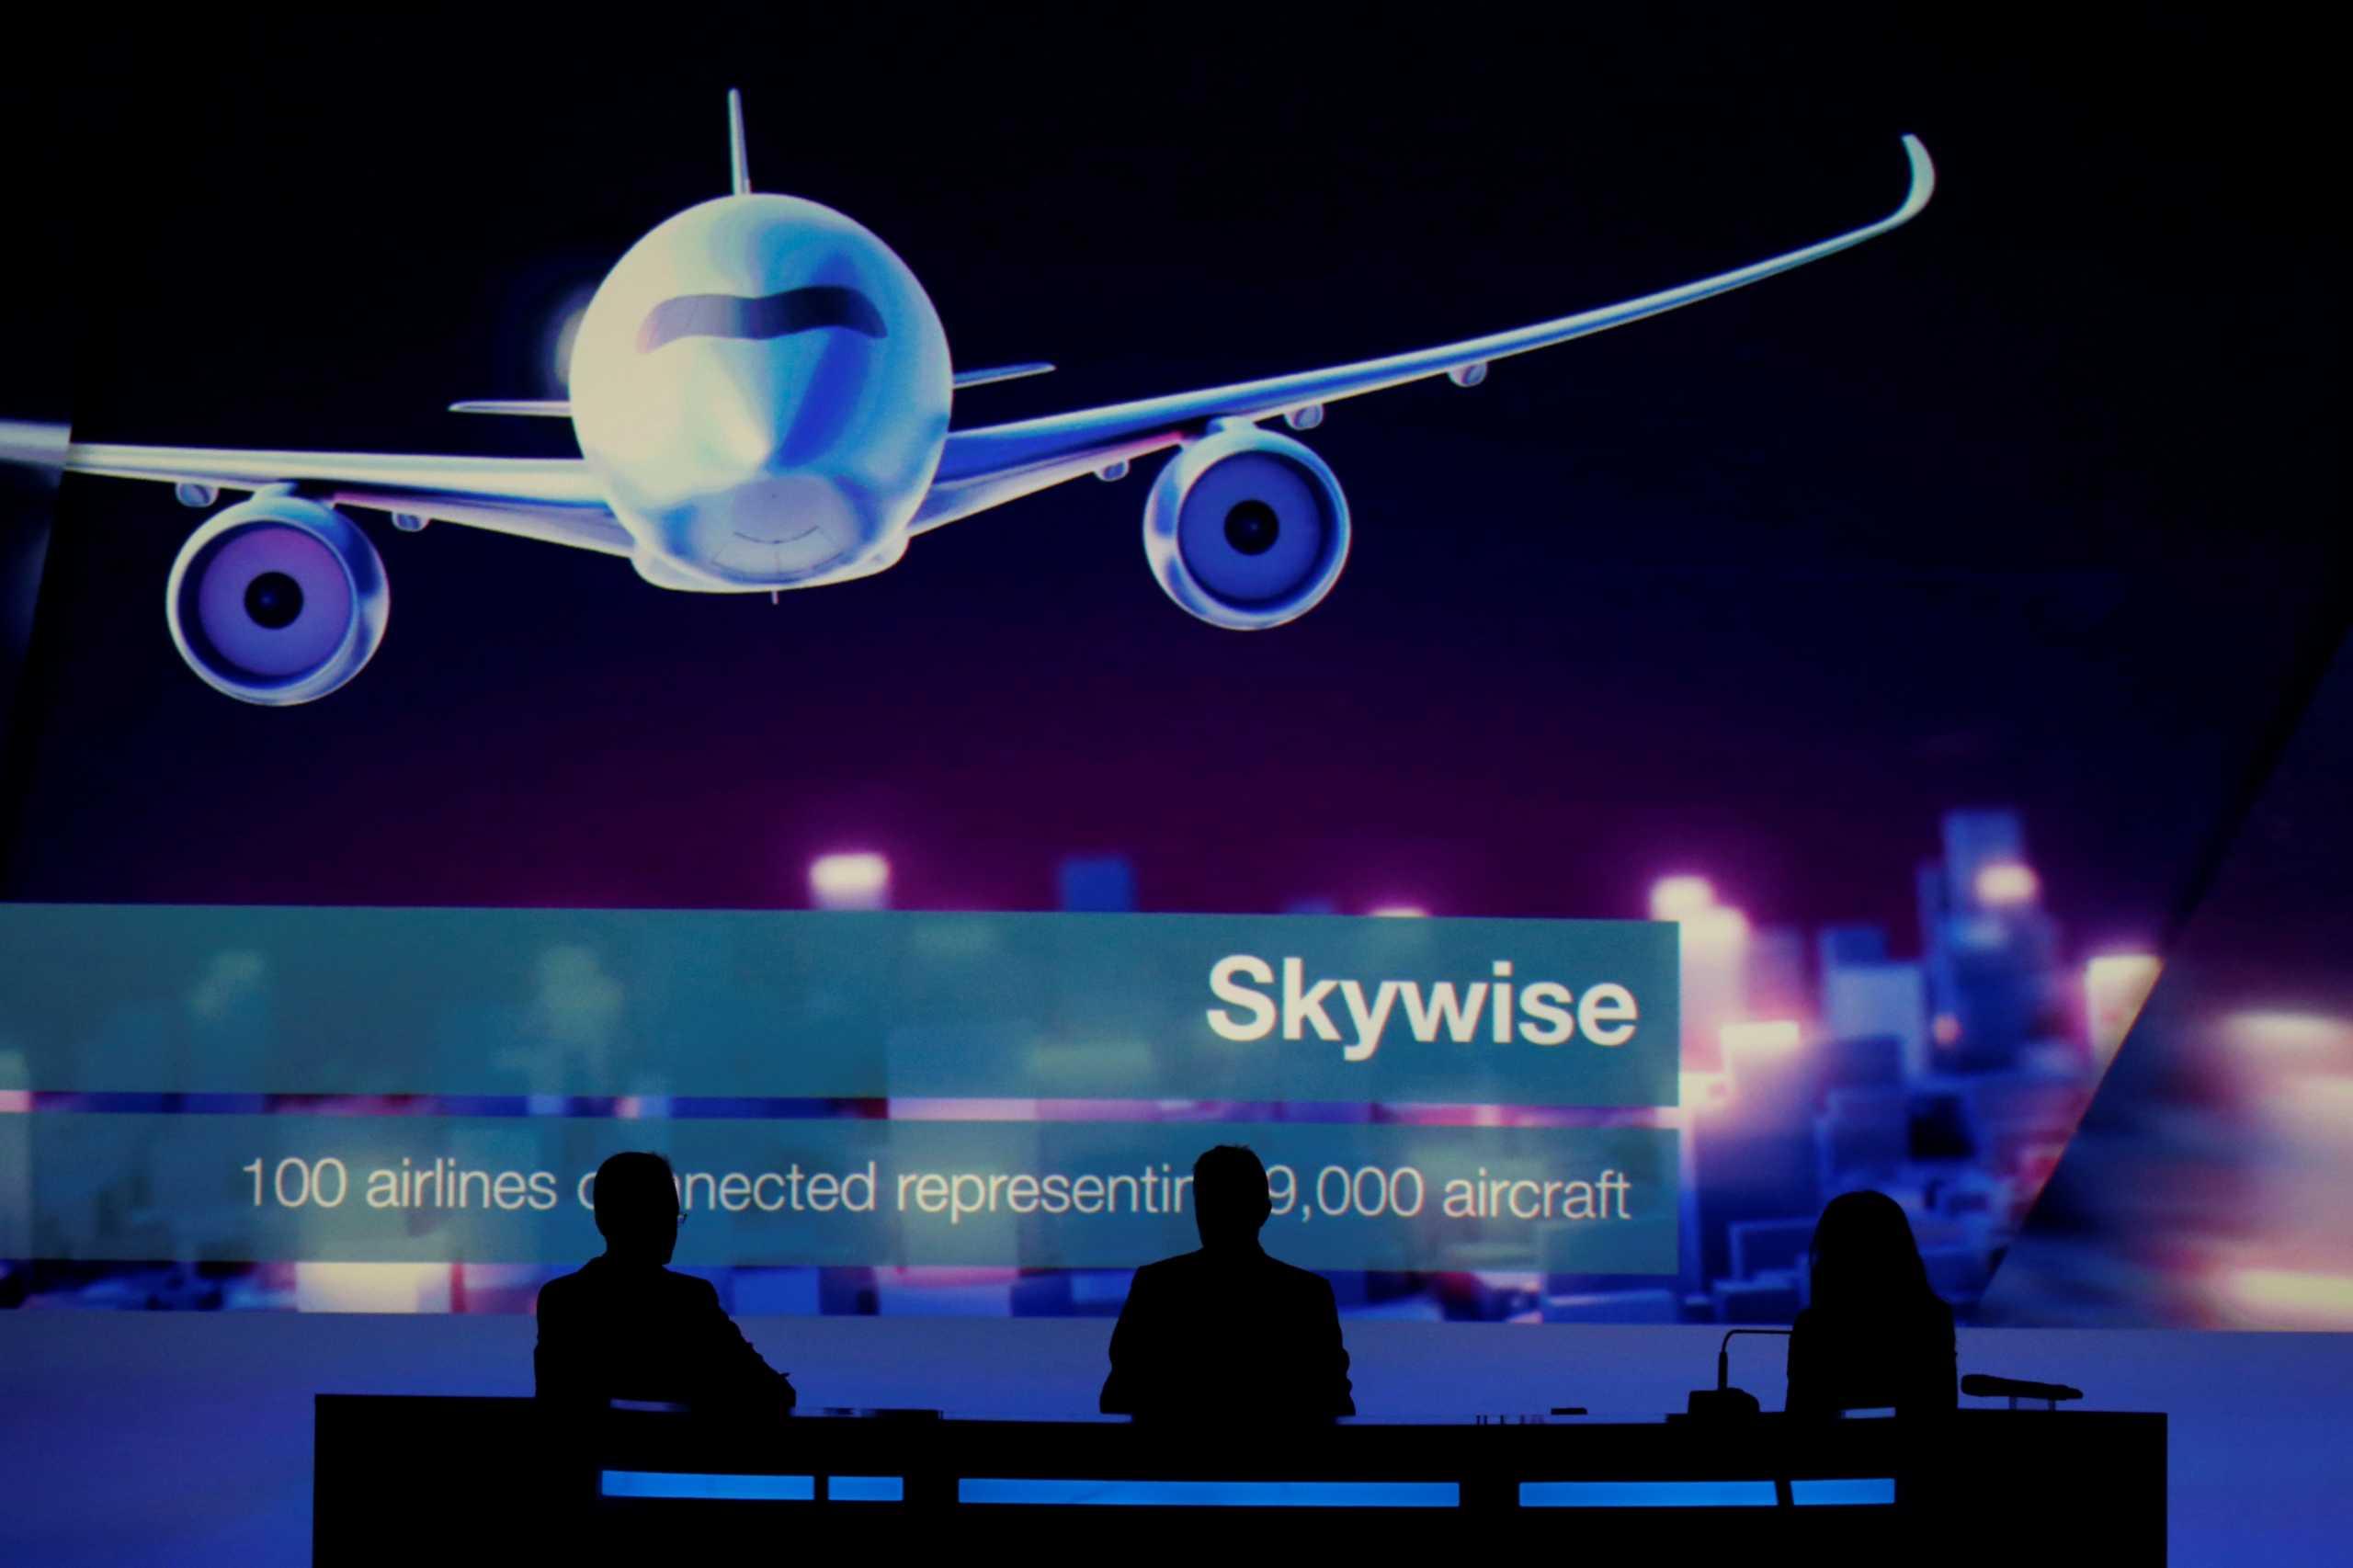 Airbus: Προανήγγειλε χιλιάδες απολύσεις λόγω μειωμένων εσόδων